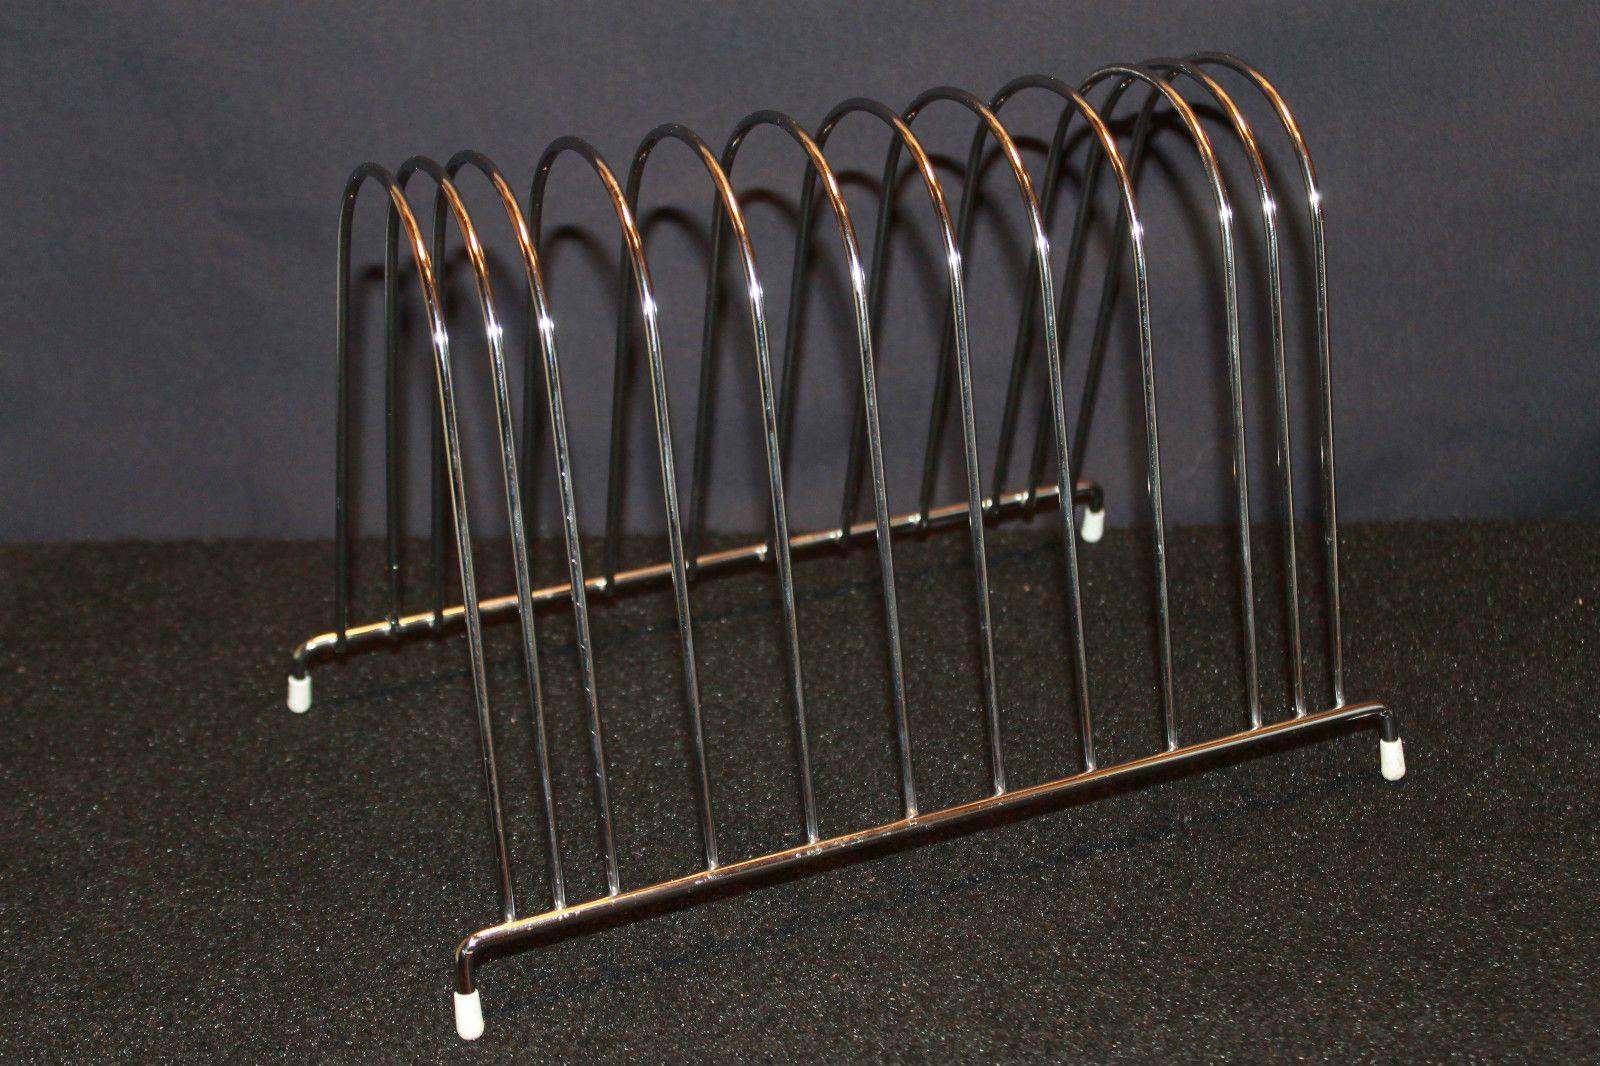 Vintage LP Metal Wire Storage Rack Stand Holder Display 1960s, Holds 40 Vinyl Records, $17.00